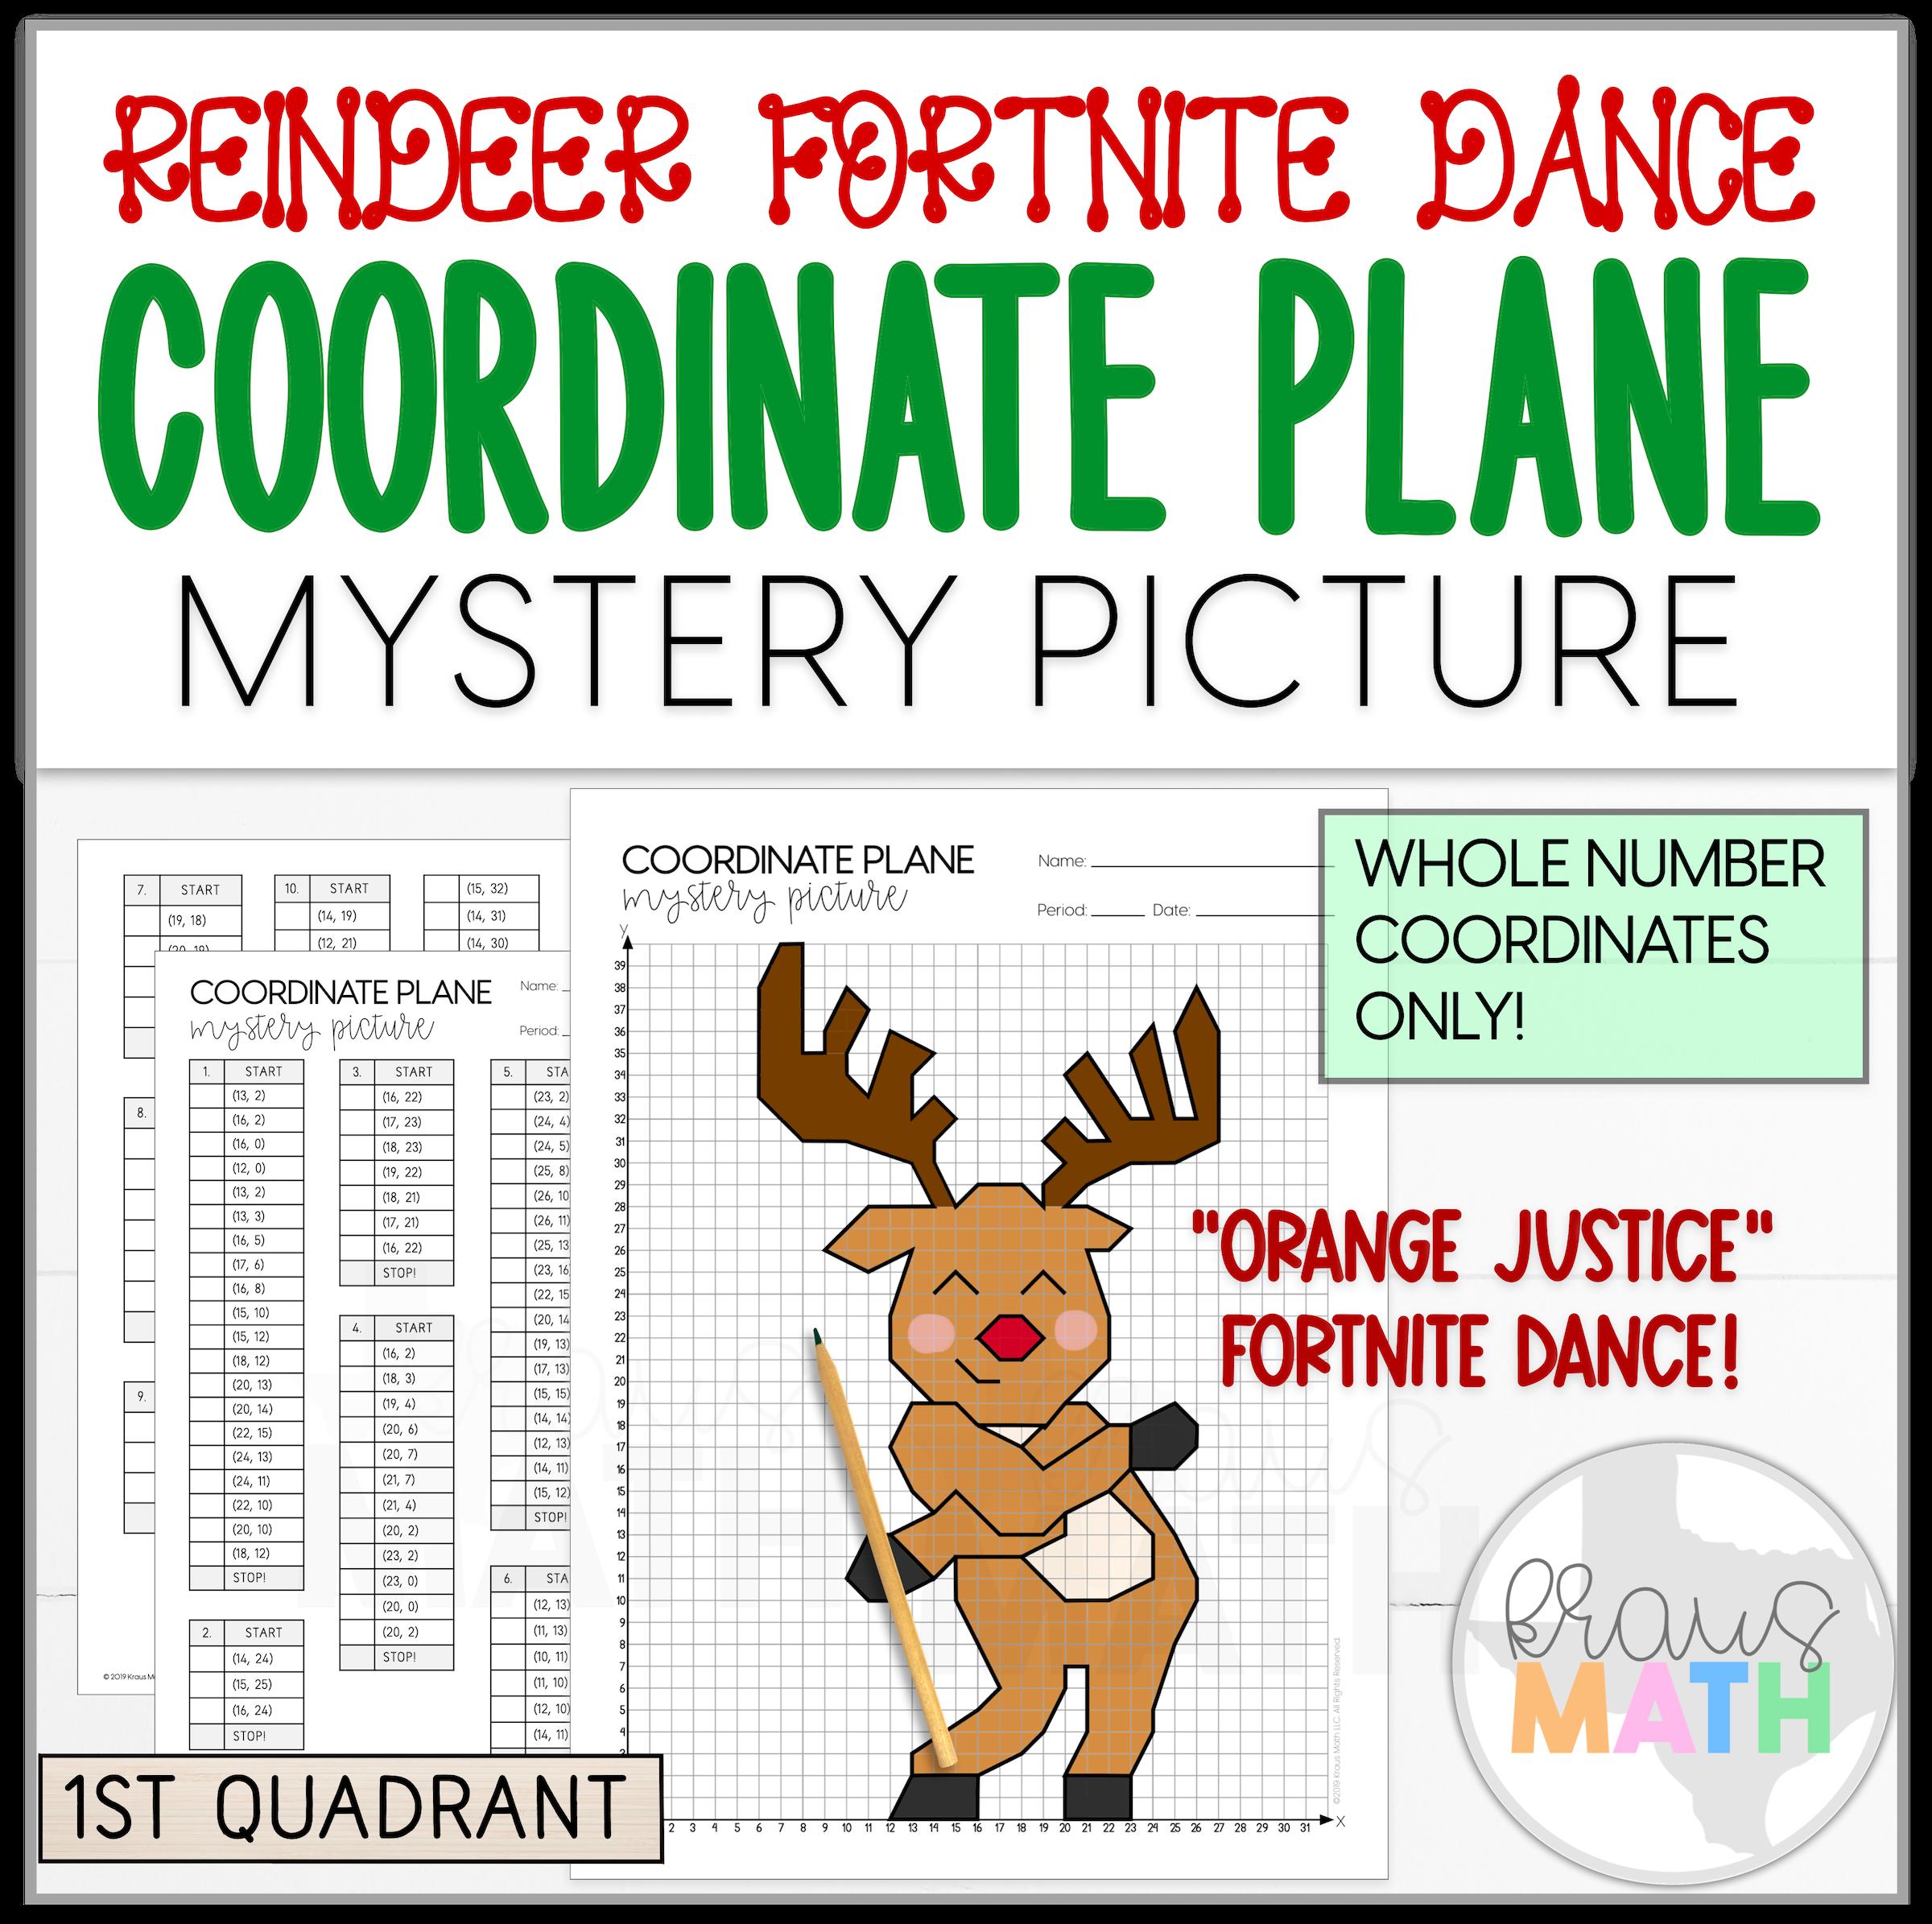 Reindeer Fortnite Orange Justice Dance Coordinate Plane